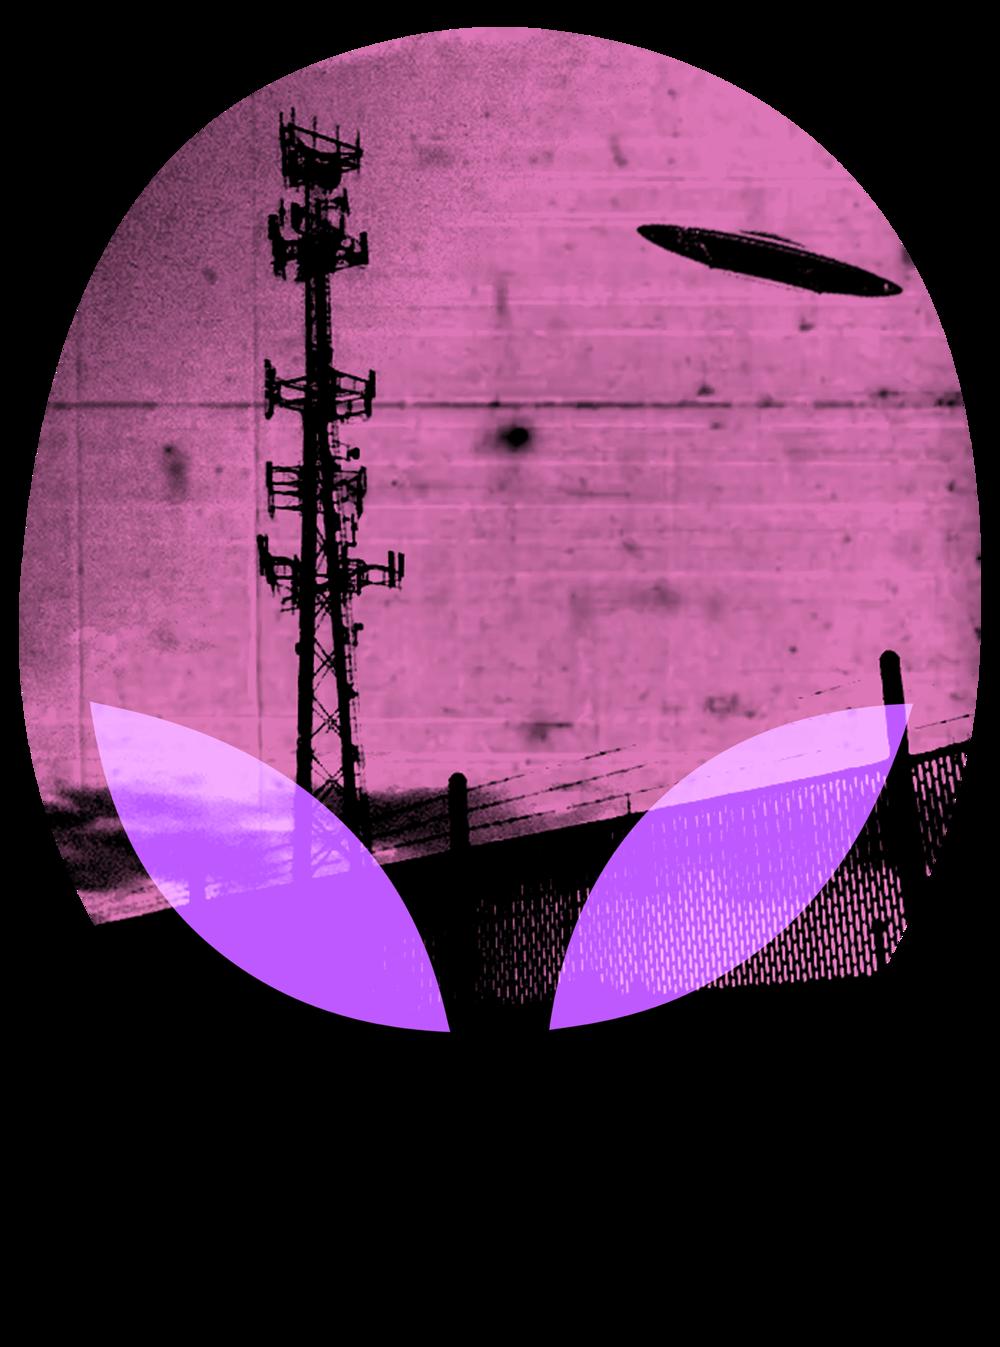 alien head ufo photo pink copy.png